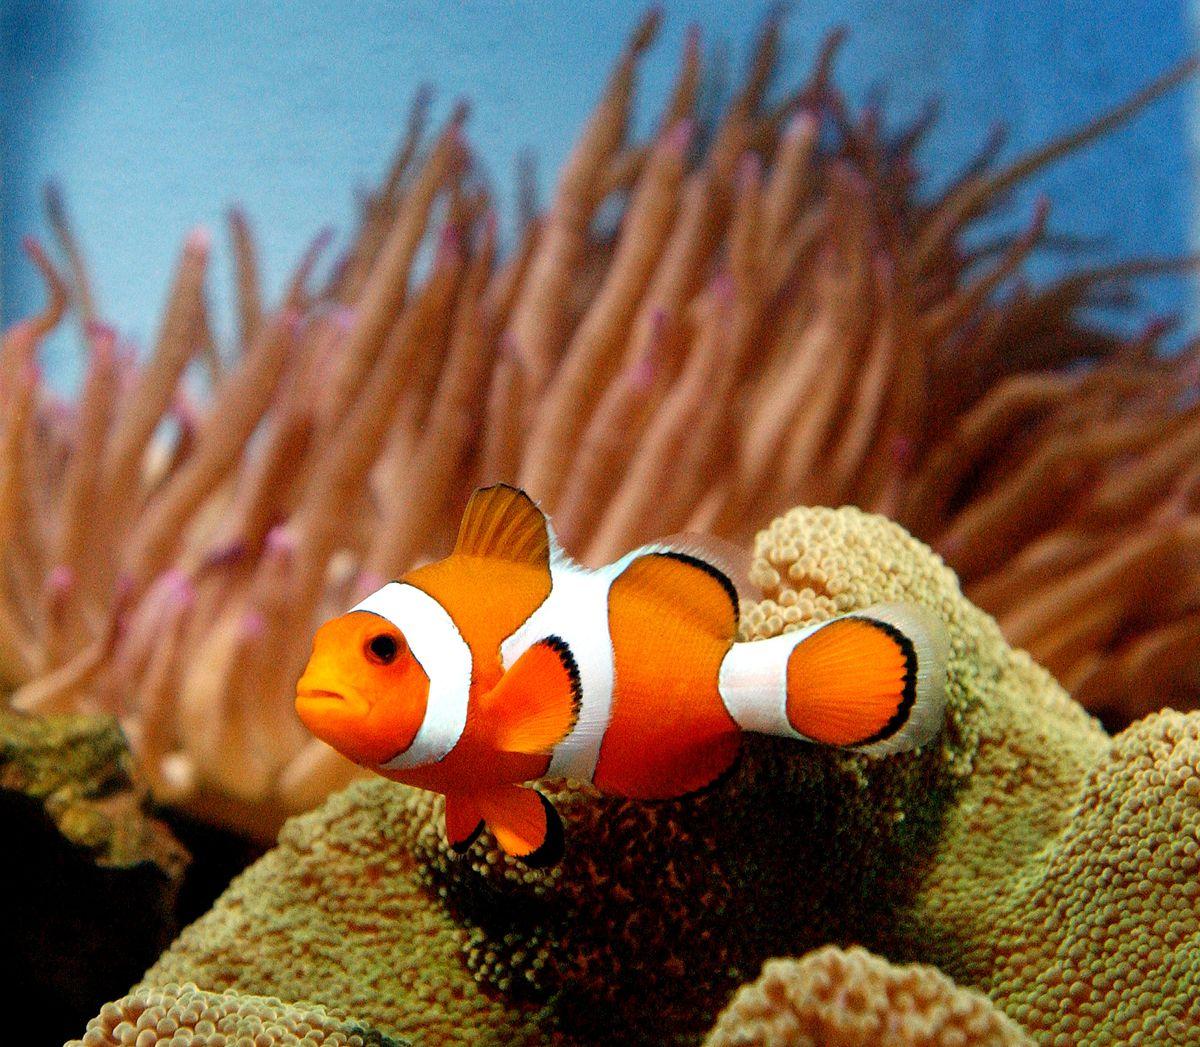 A photograph of a clownfish.